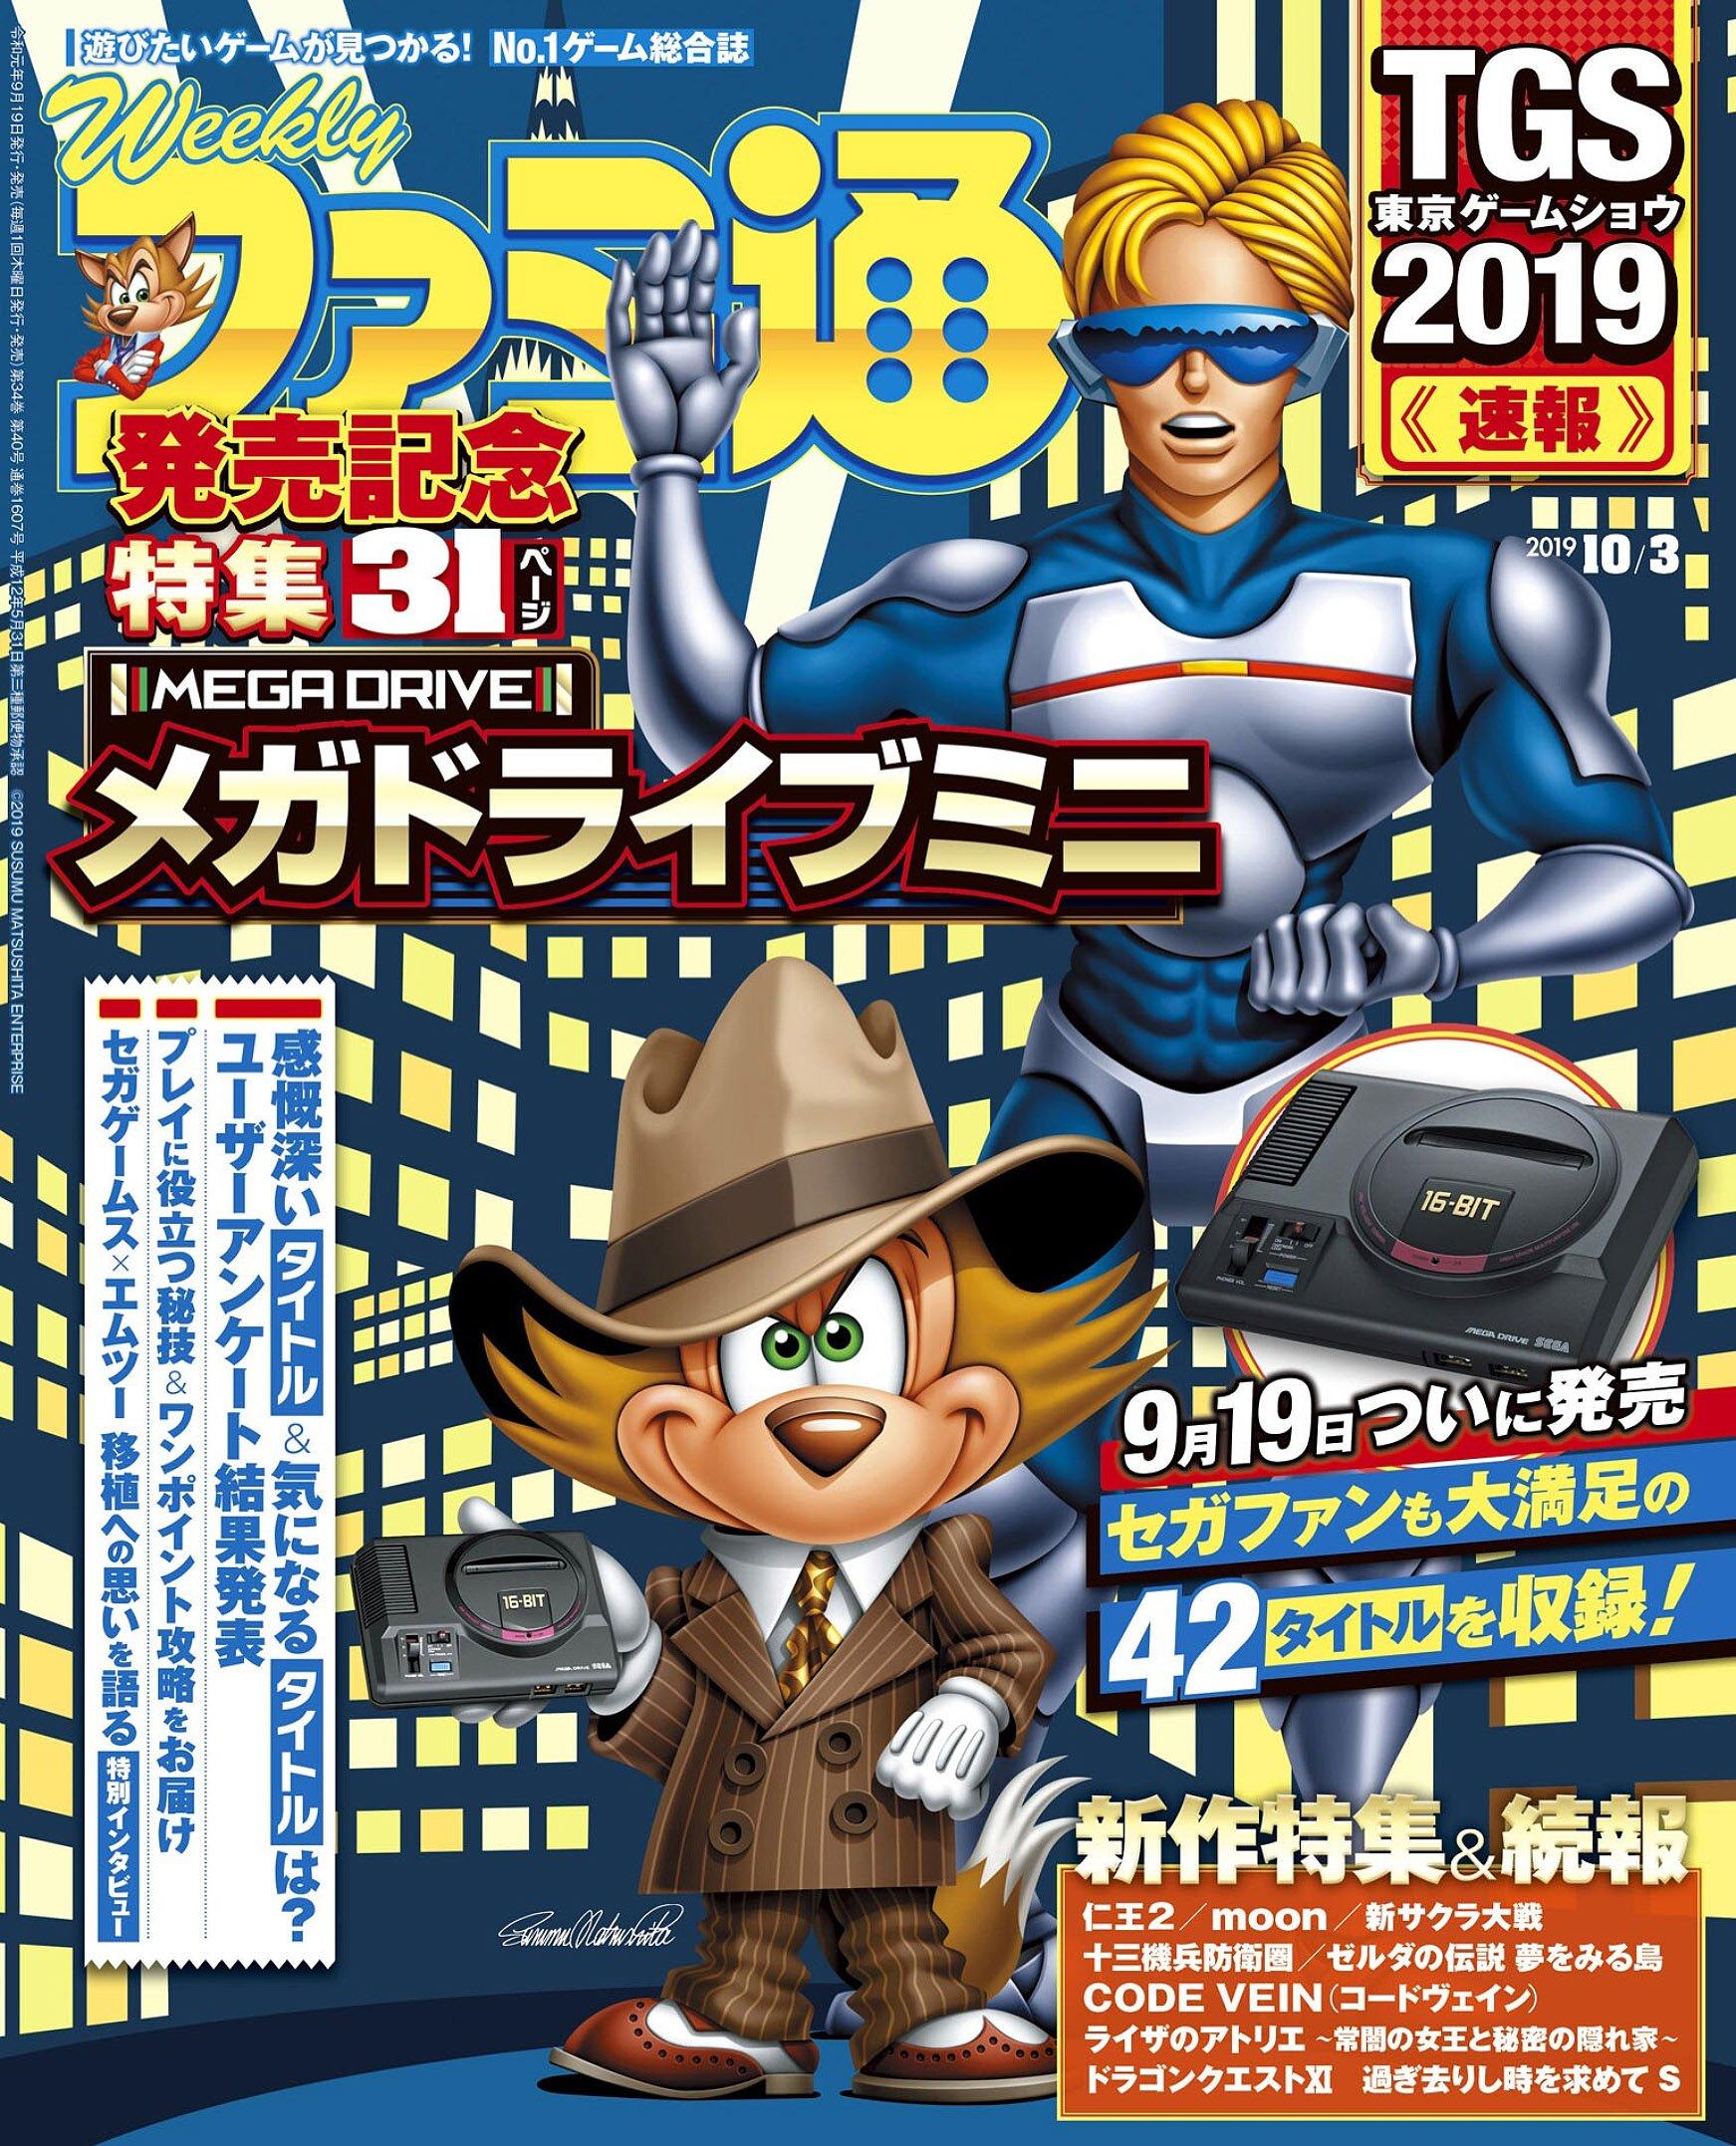 Famitsu 1607 (October 3, 2019)